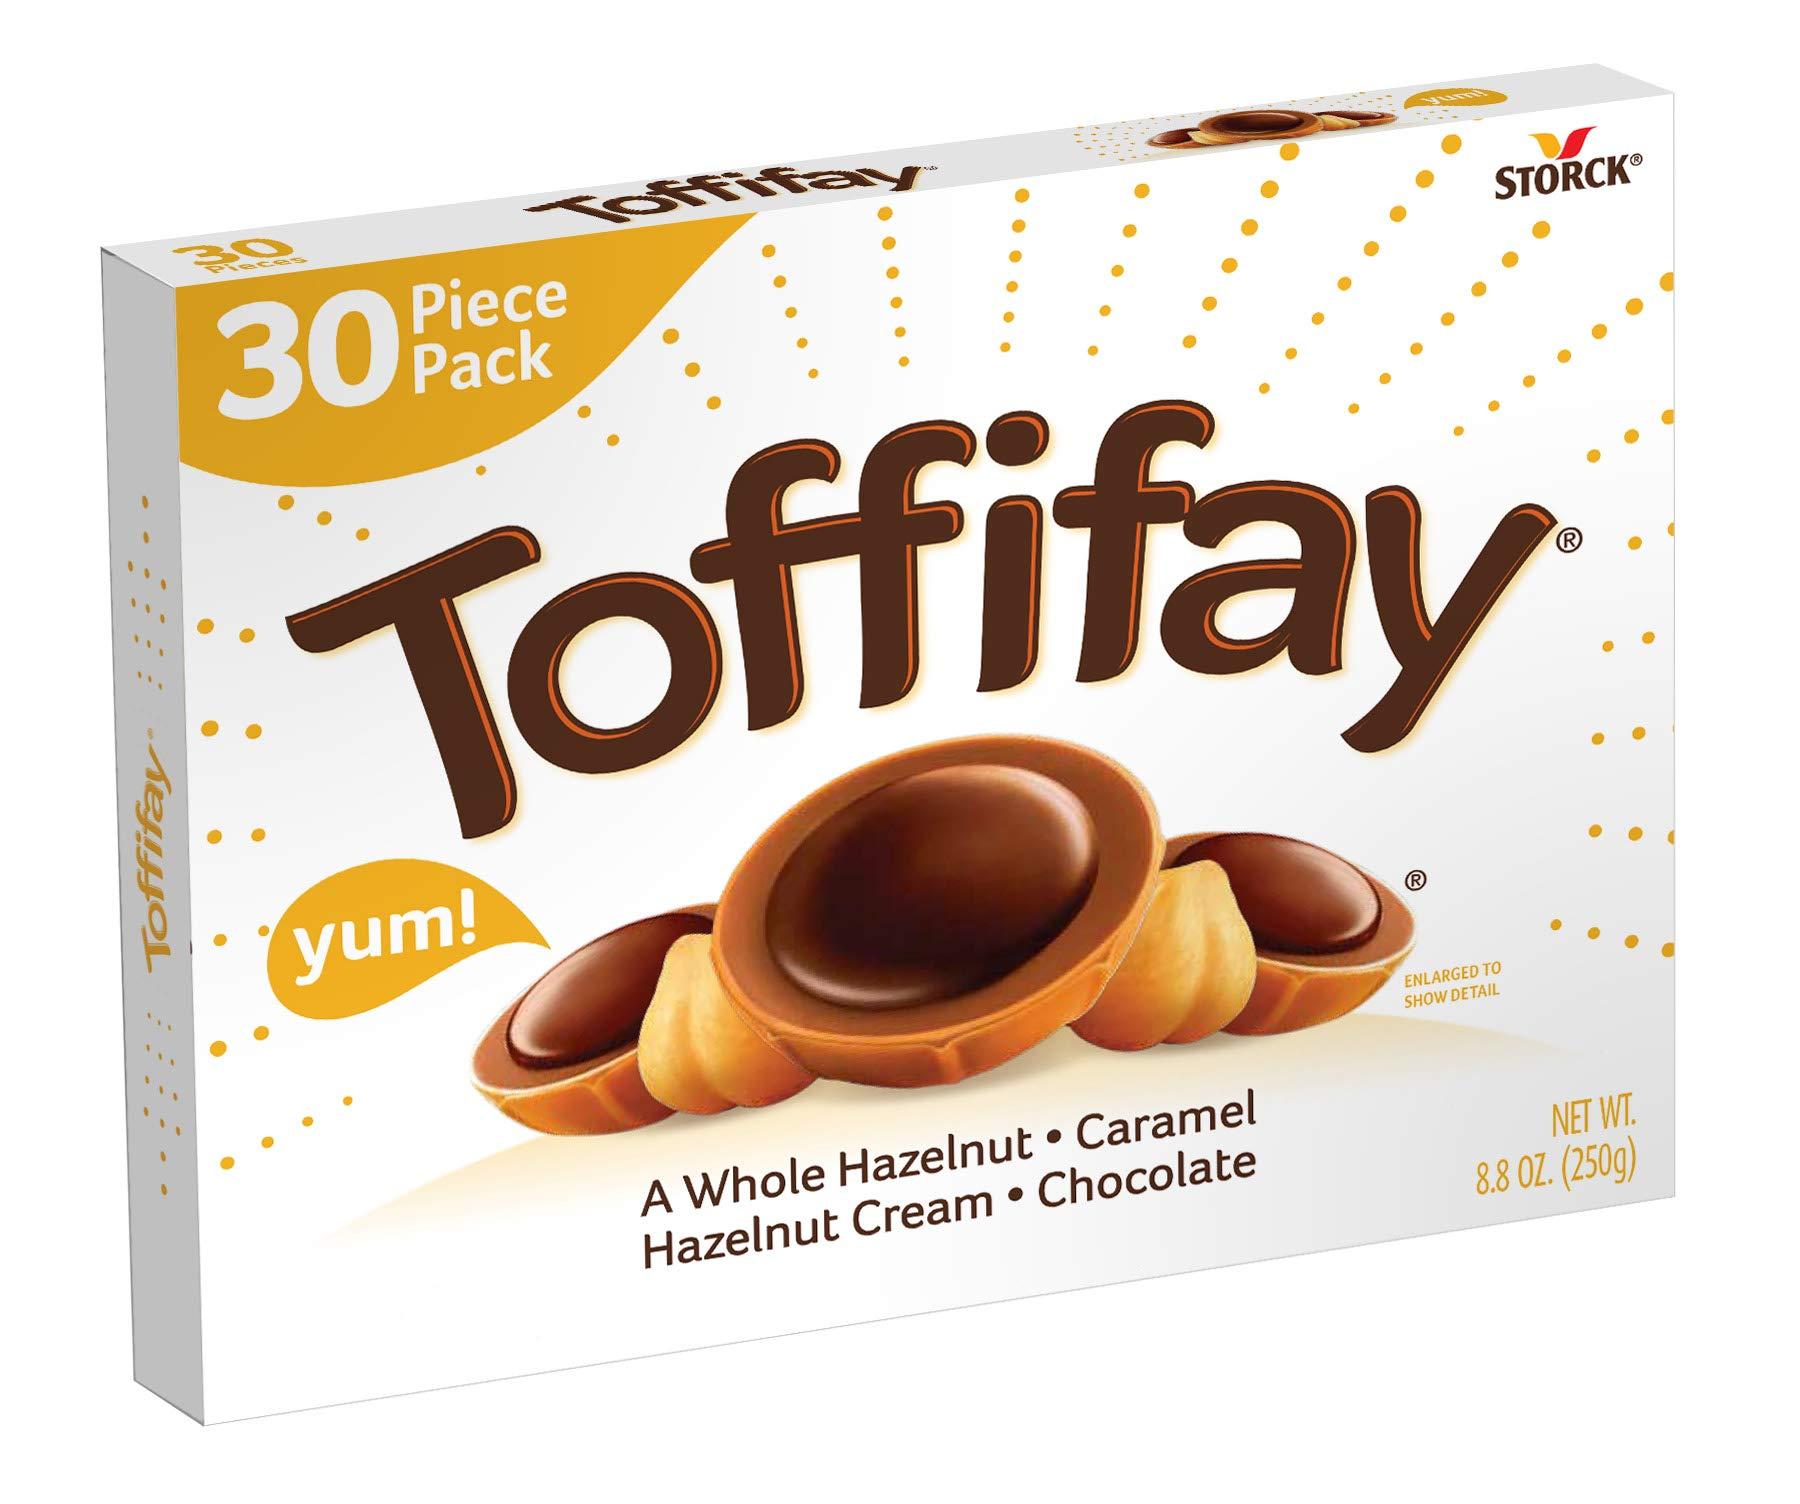 Toffifay Toffifay, 8.8 oz 30 Piece Box, 8.8 Ounce